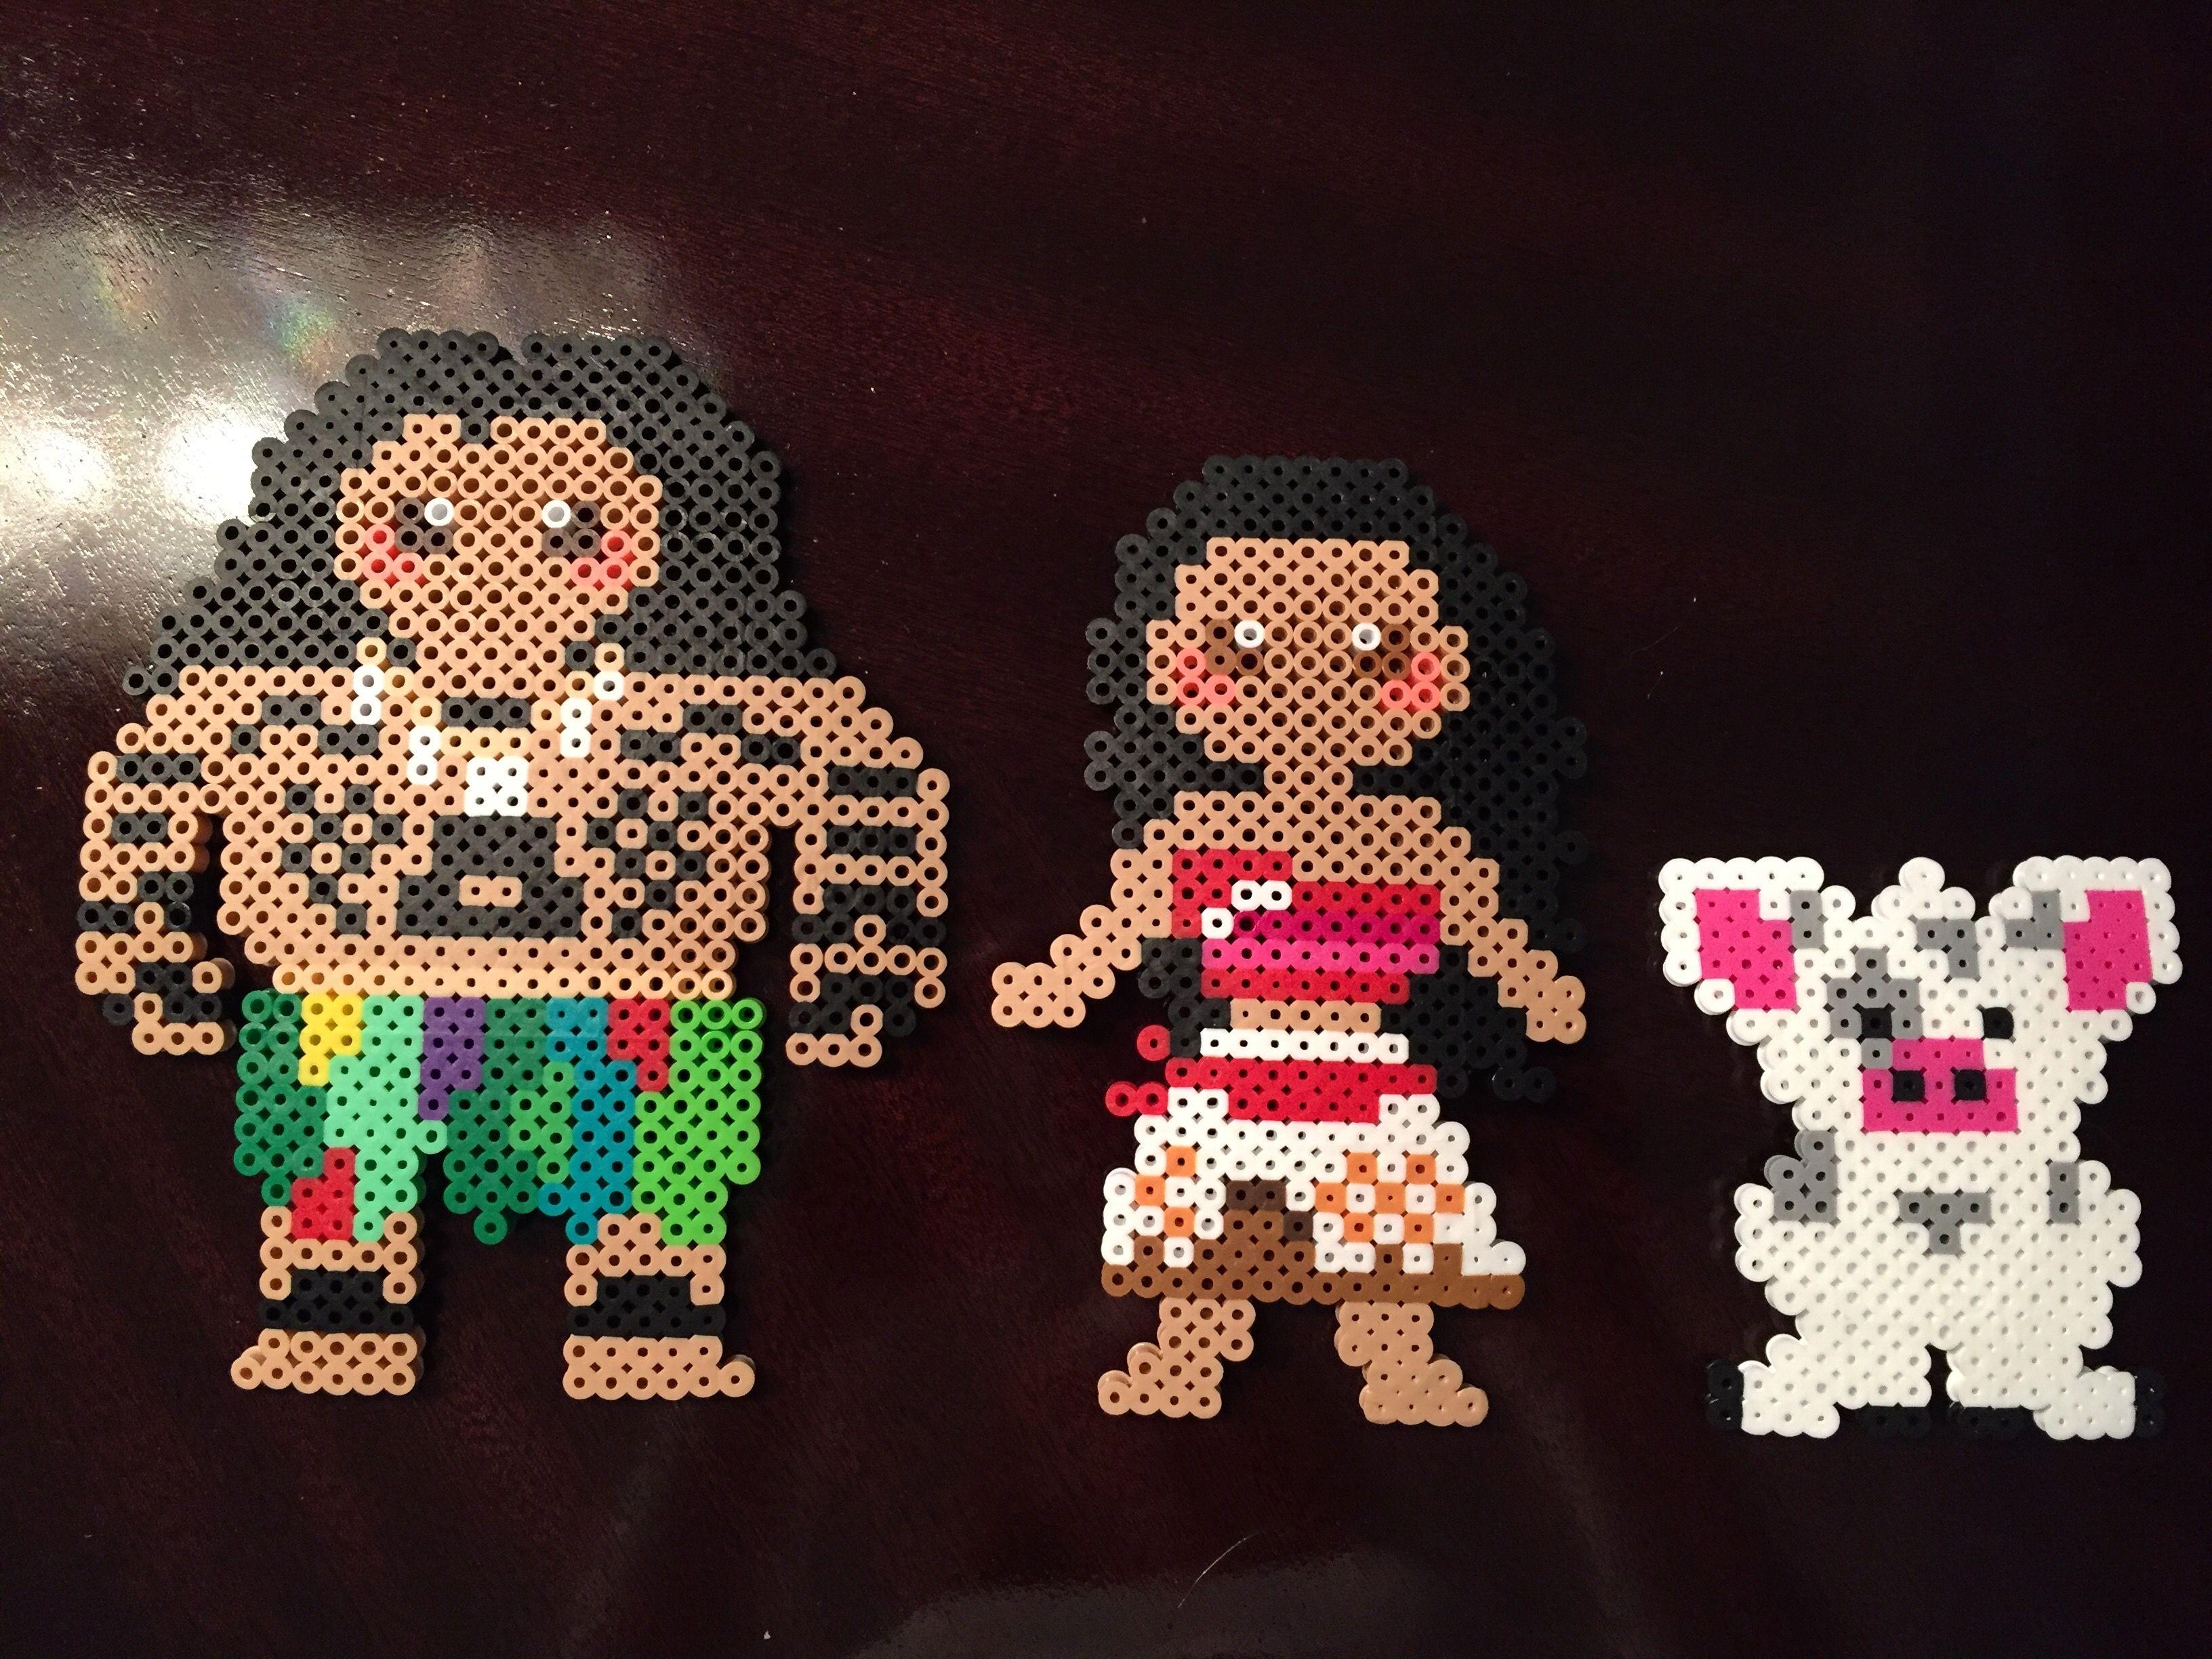 Disney Moana characters  Maui, Moana and Pua made from perler beads